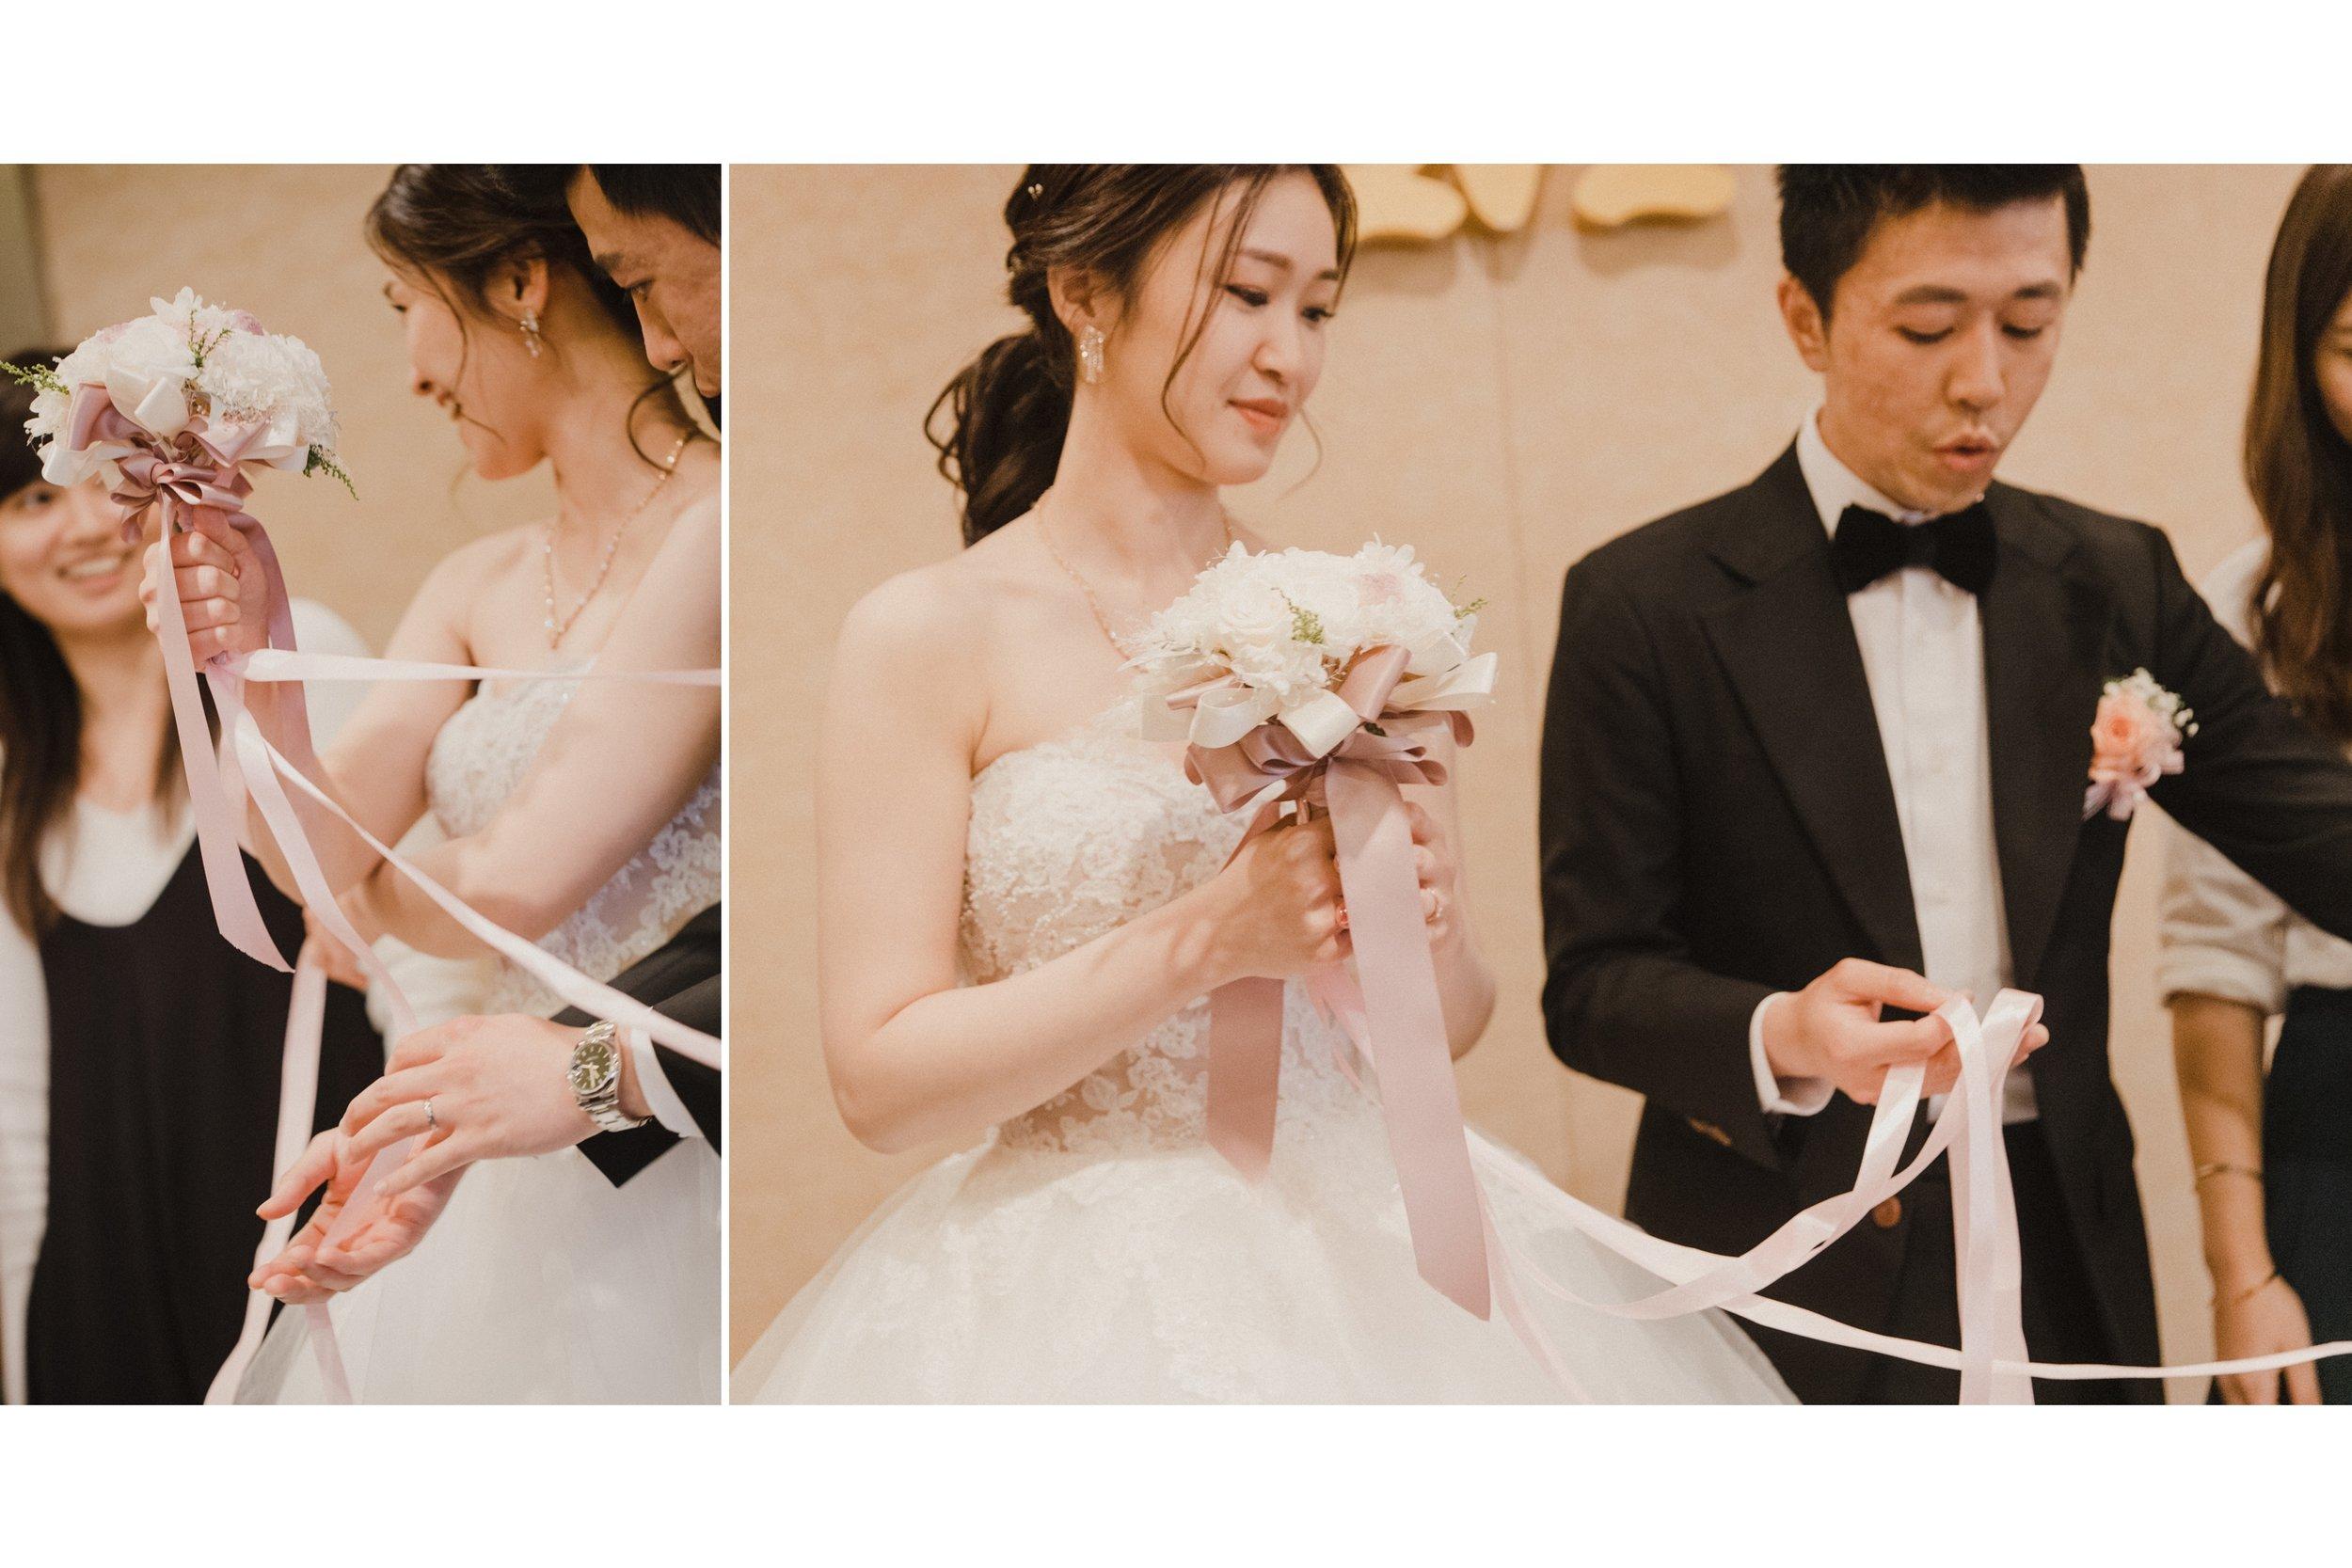 wedding-caridee-oscar-lunch-ambassador-hsinchu-結婚午宴-新竹國賓_110.jpg